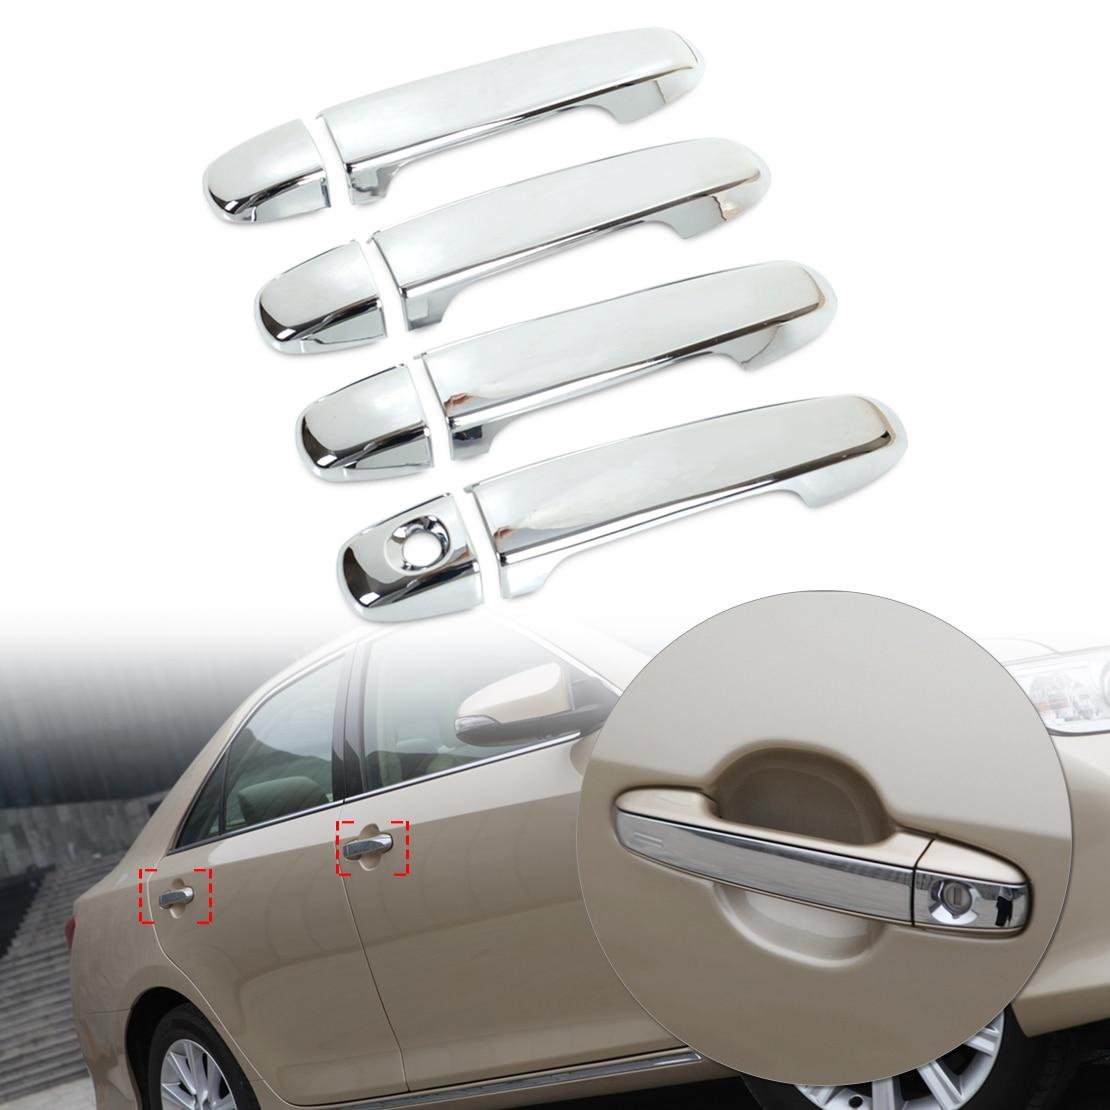 все цены на beler ABS Plastics Chrome 8PCS Door Handle Cover Trim fit for Toyota Camry 2012 2013 2014